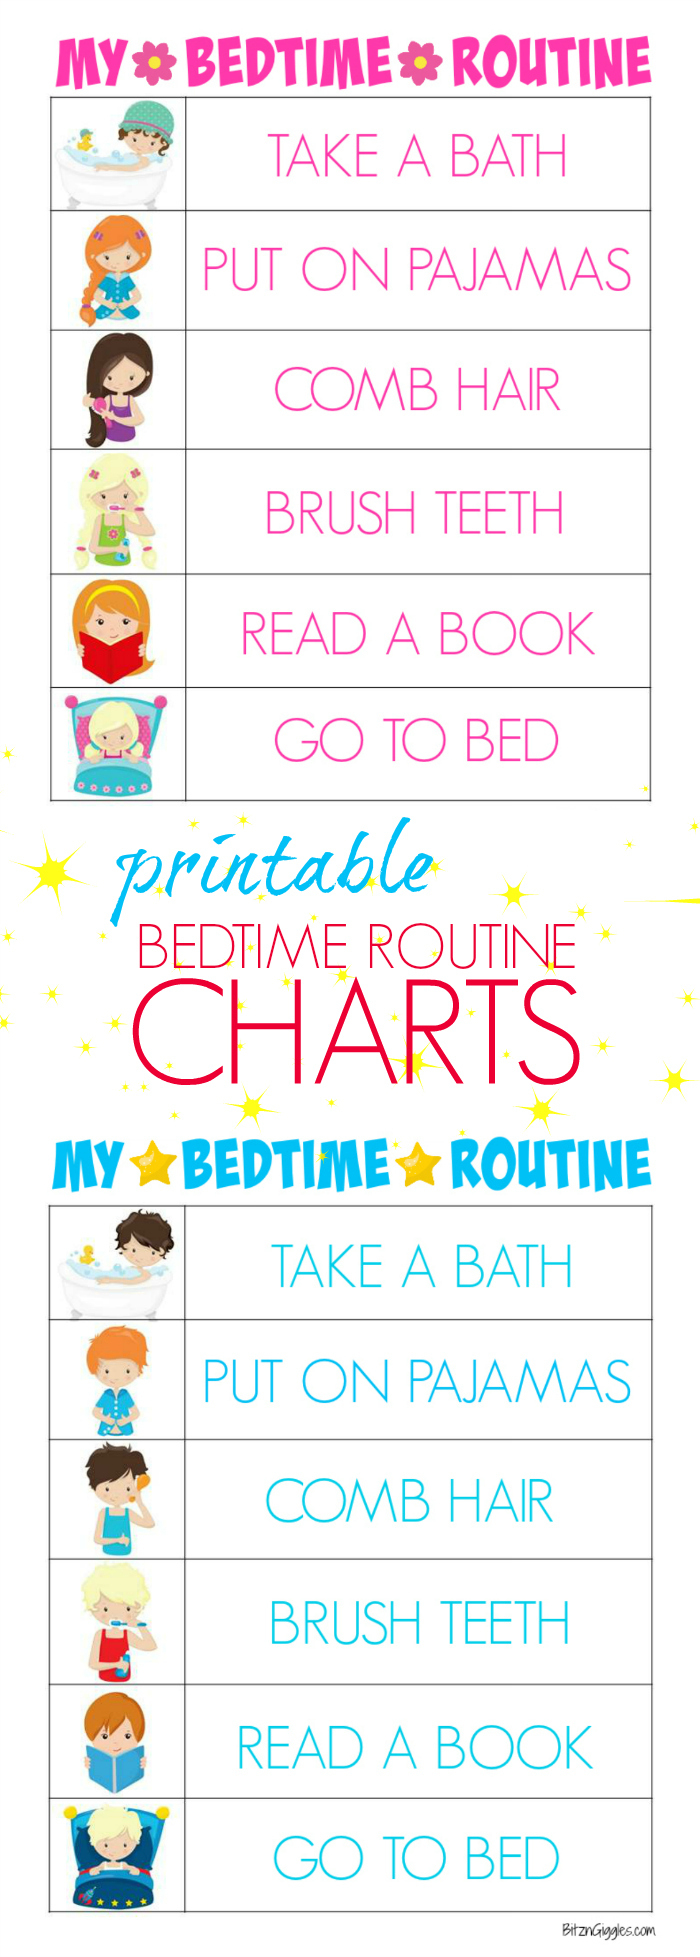 Printable Bedtime Routine Charts - Bitz & Giggles - Free Printable Bedtime Routine Chart